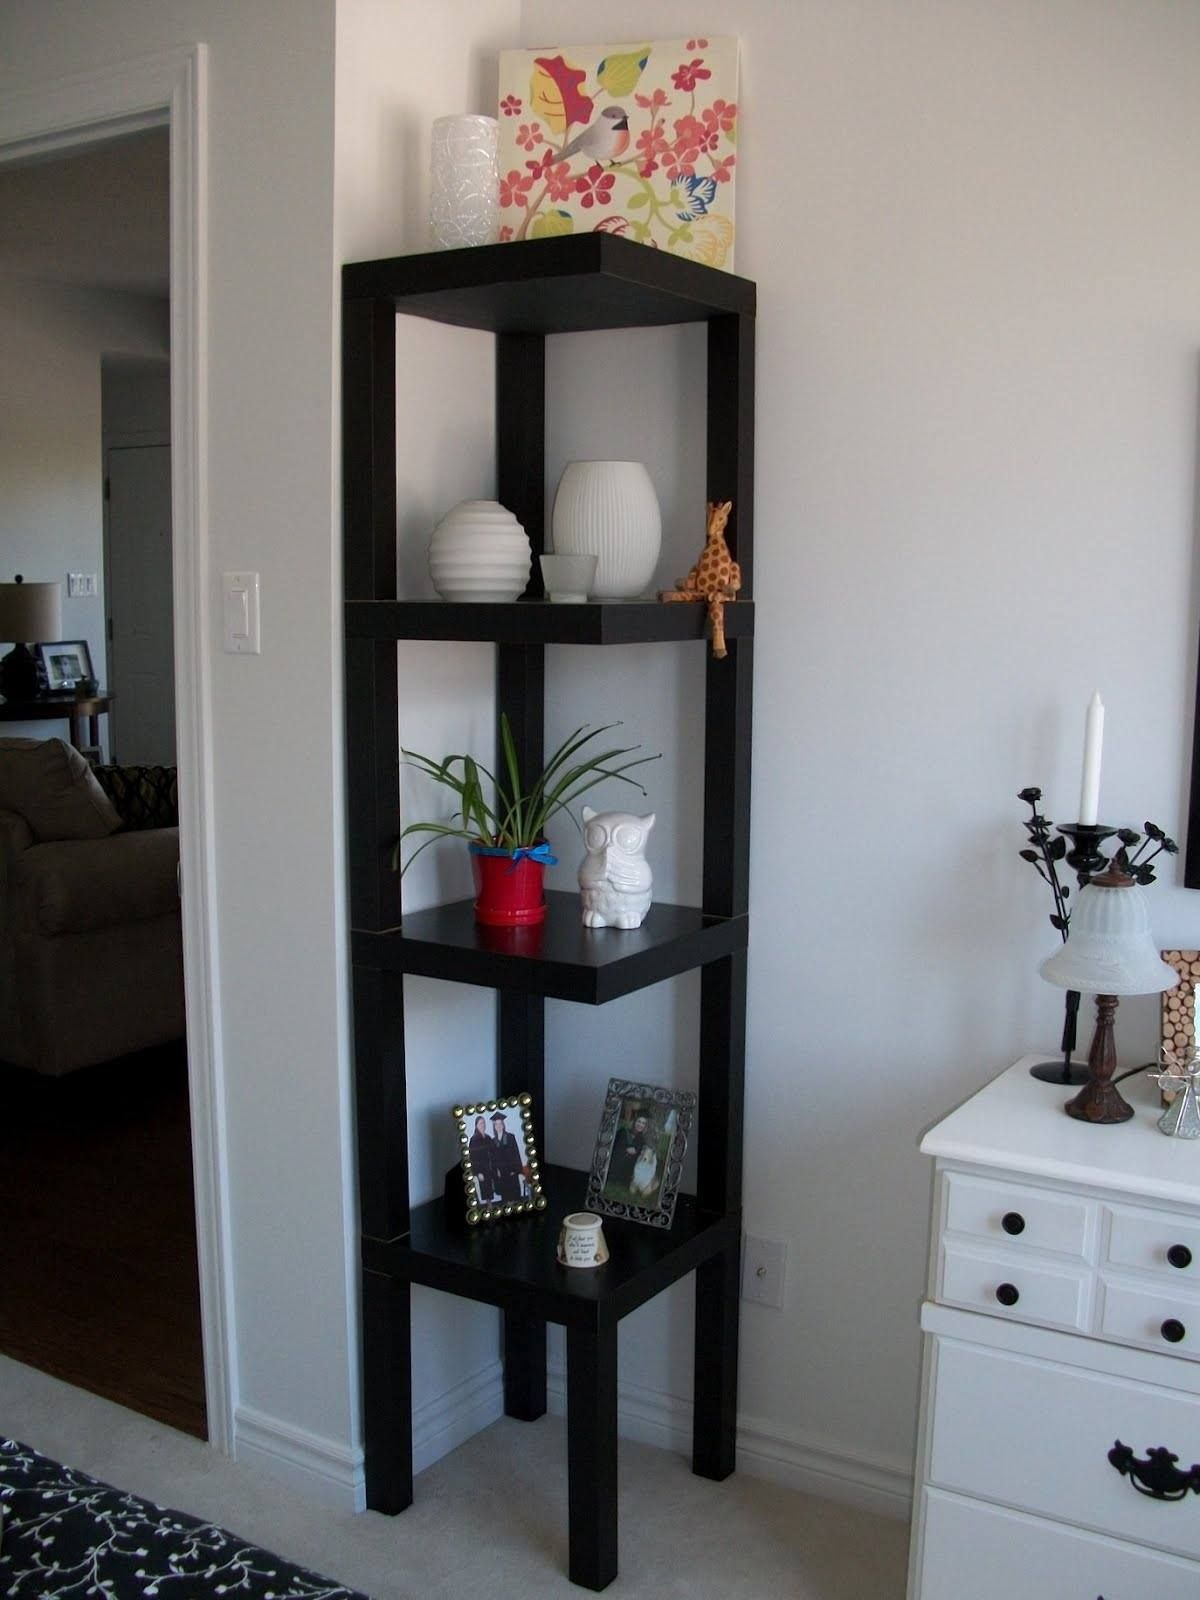 20 cool corner shelf designs for your home hanging shelves rh pinterest com